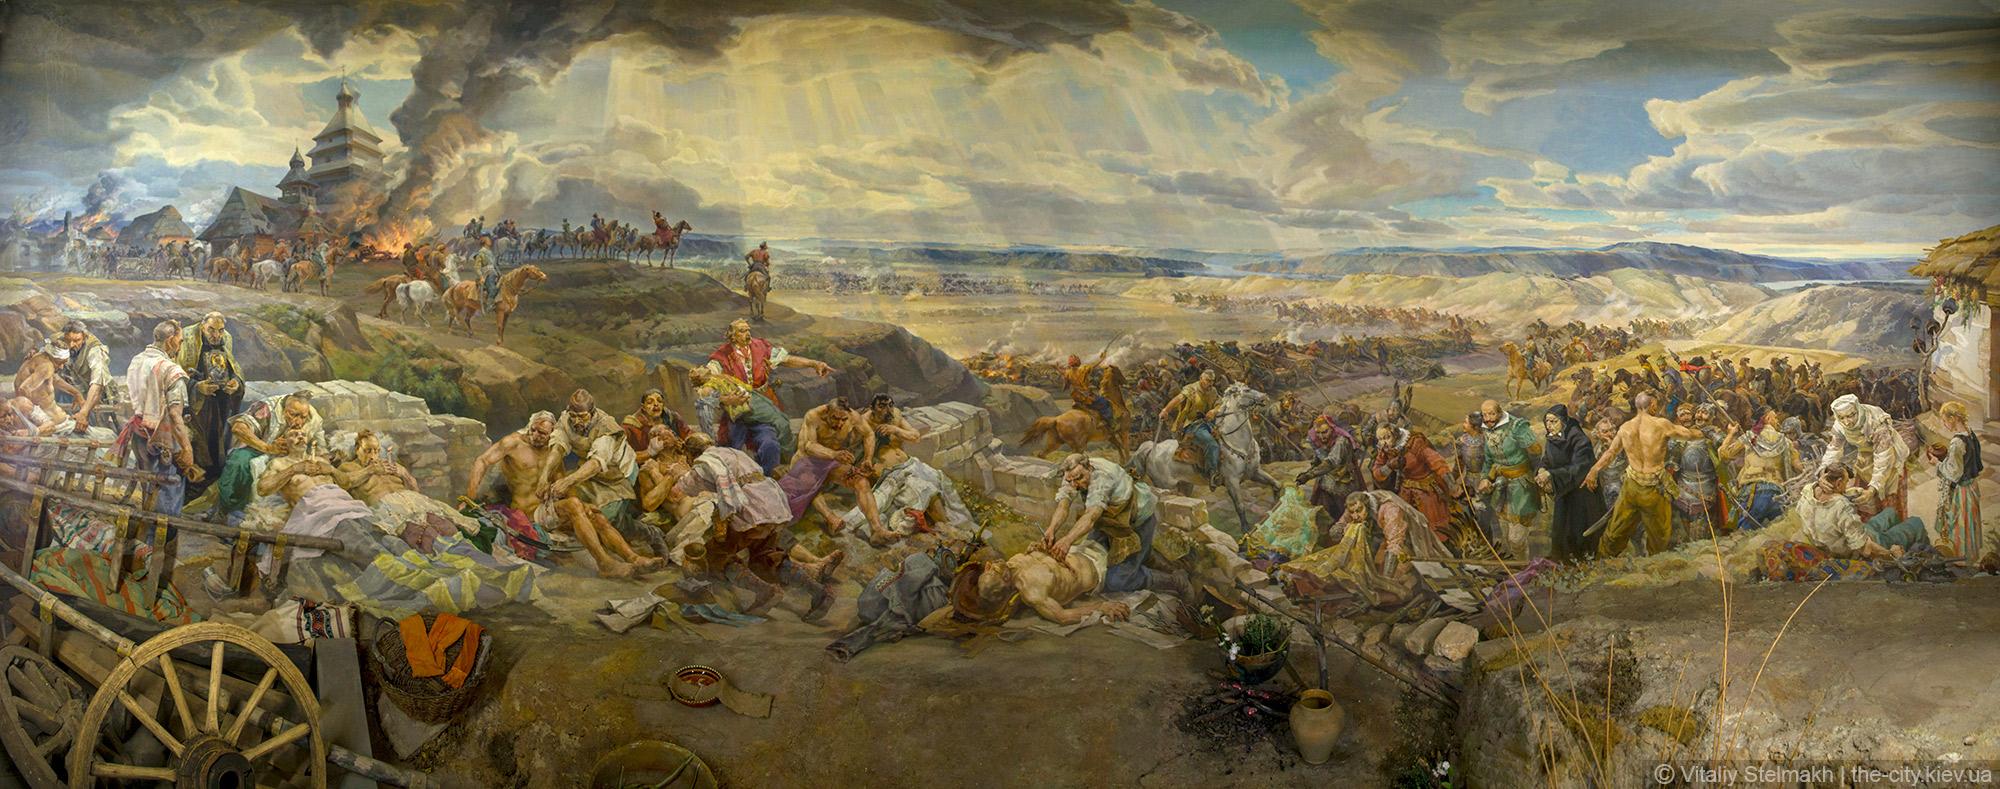 Панорама помощь раненым казакам в бою